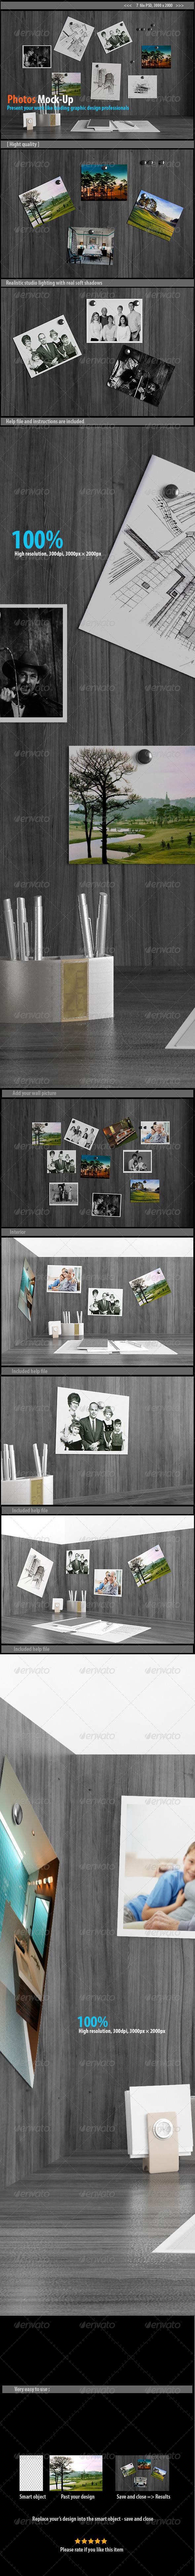 GraphicRiver Photos Mockups 8391124